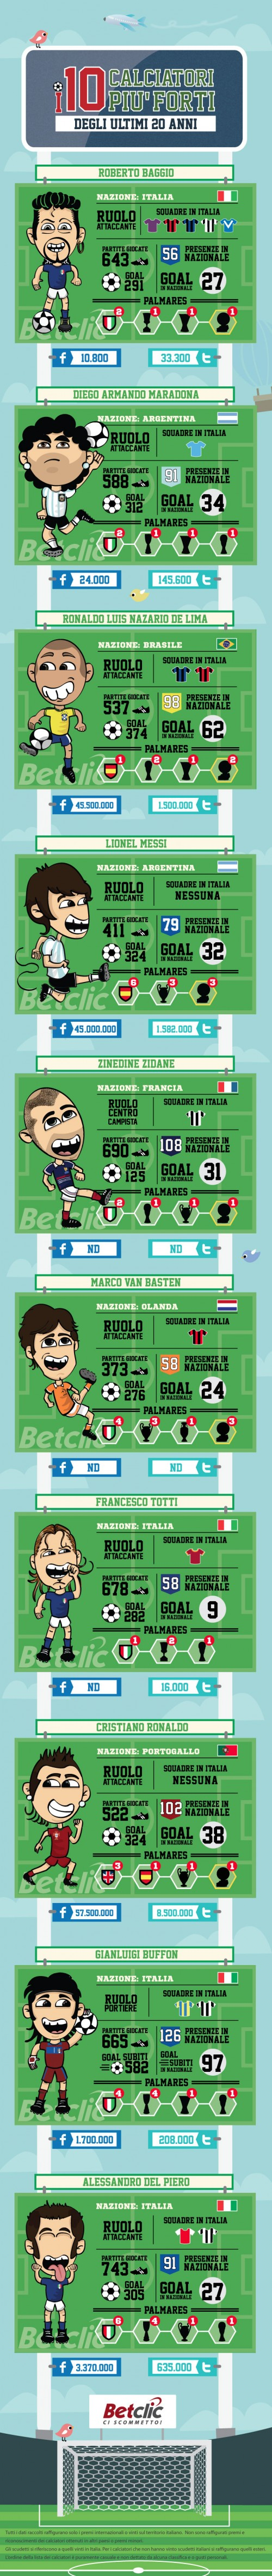 calciatori_infografica